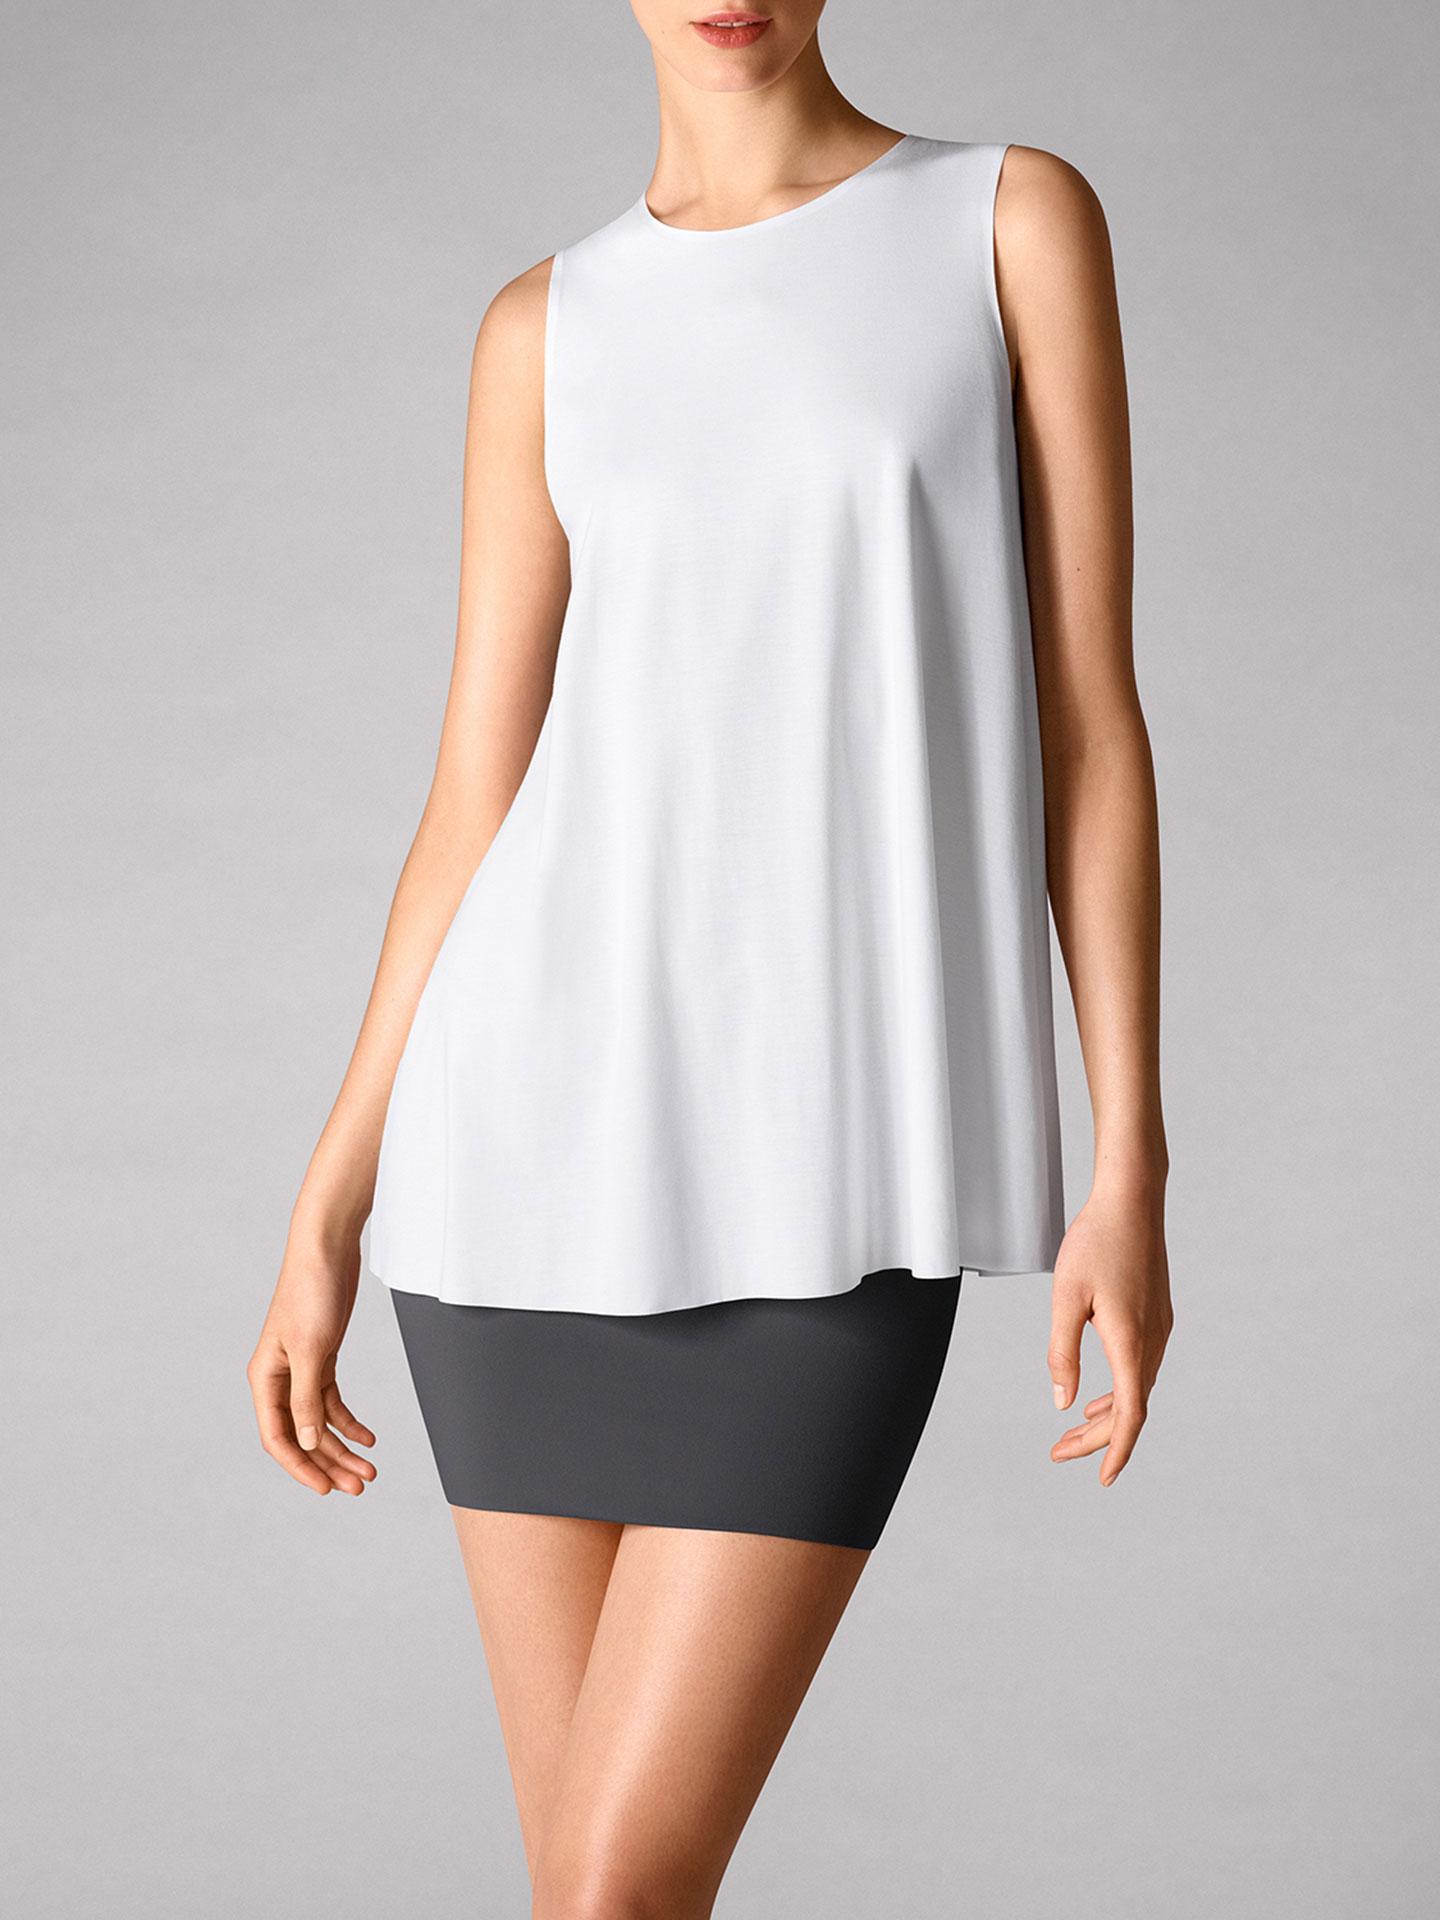 Wolford Apparel & Accessories > Clothing > Abbigliamento Donna Pure Top